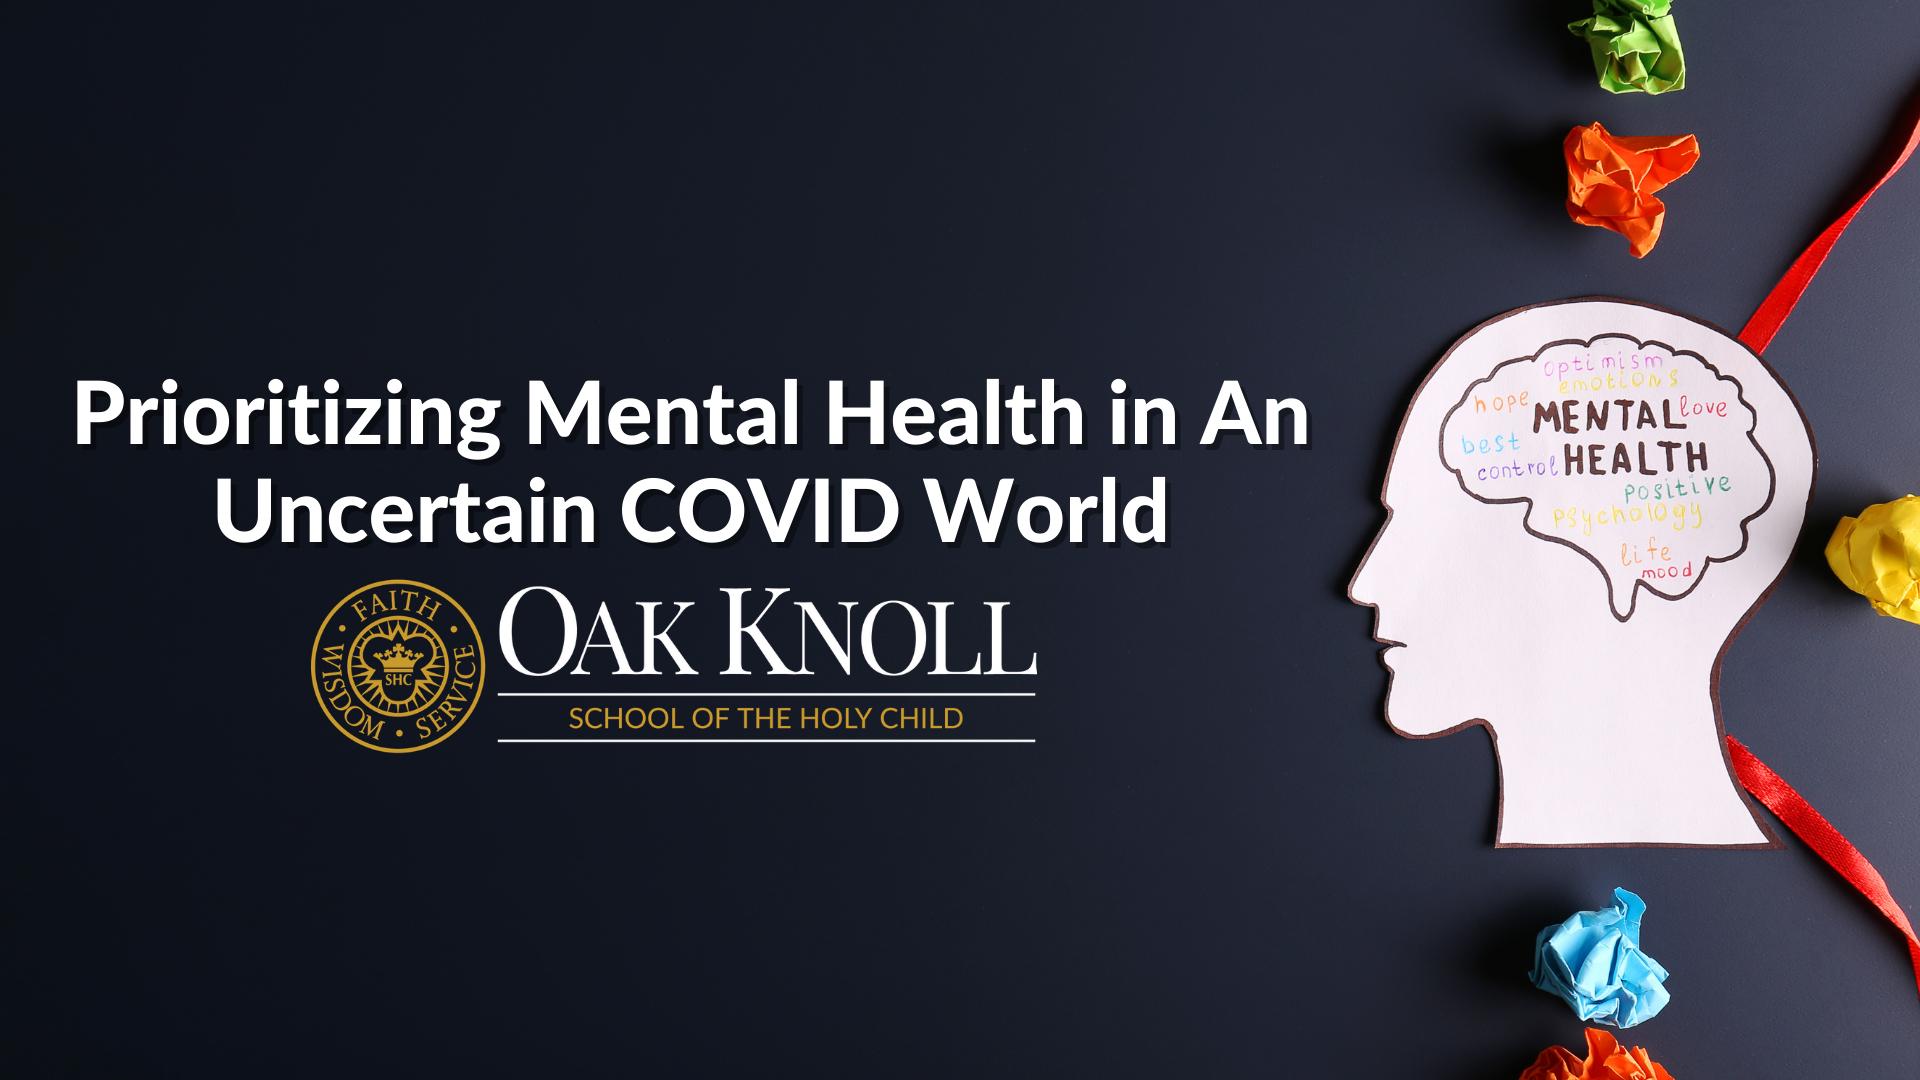 Prioritizing Mental Health in An Uncertain COVID World